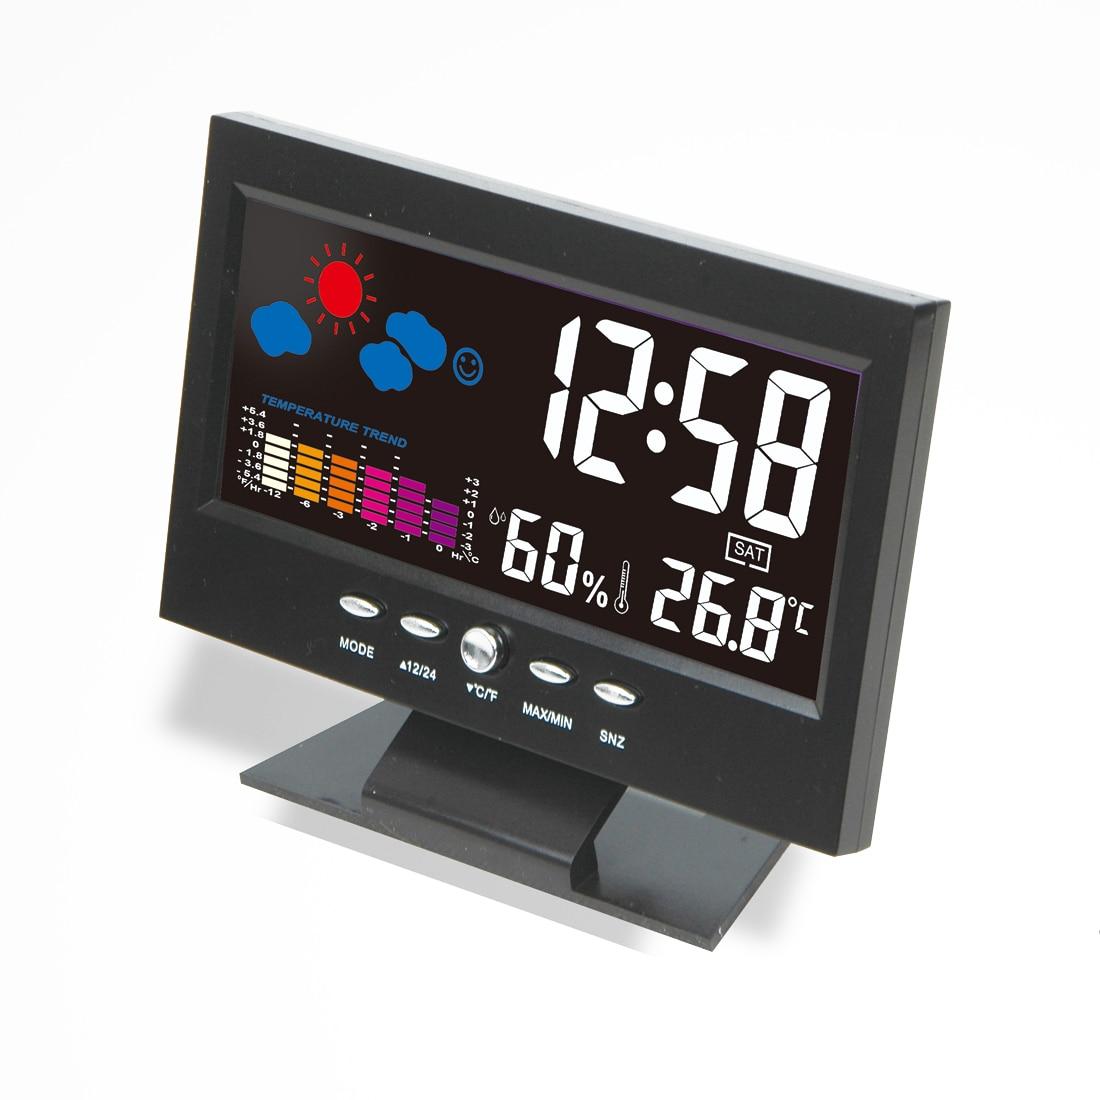 New Digital Thermometer Hygrometer weather station Alarm Clock temperature gauge Colorfu ...